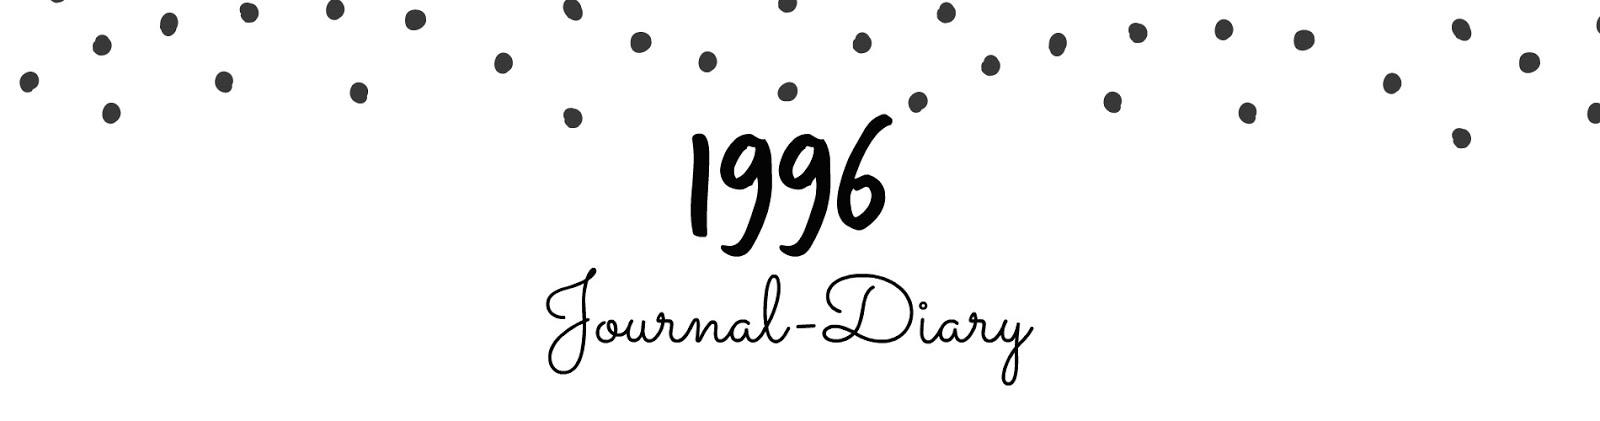 1996 journal-diary